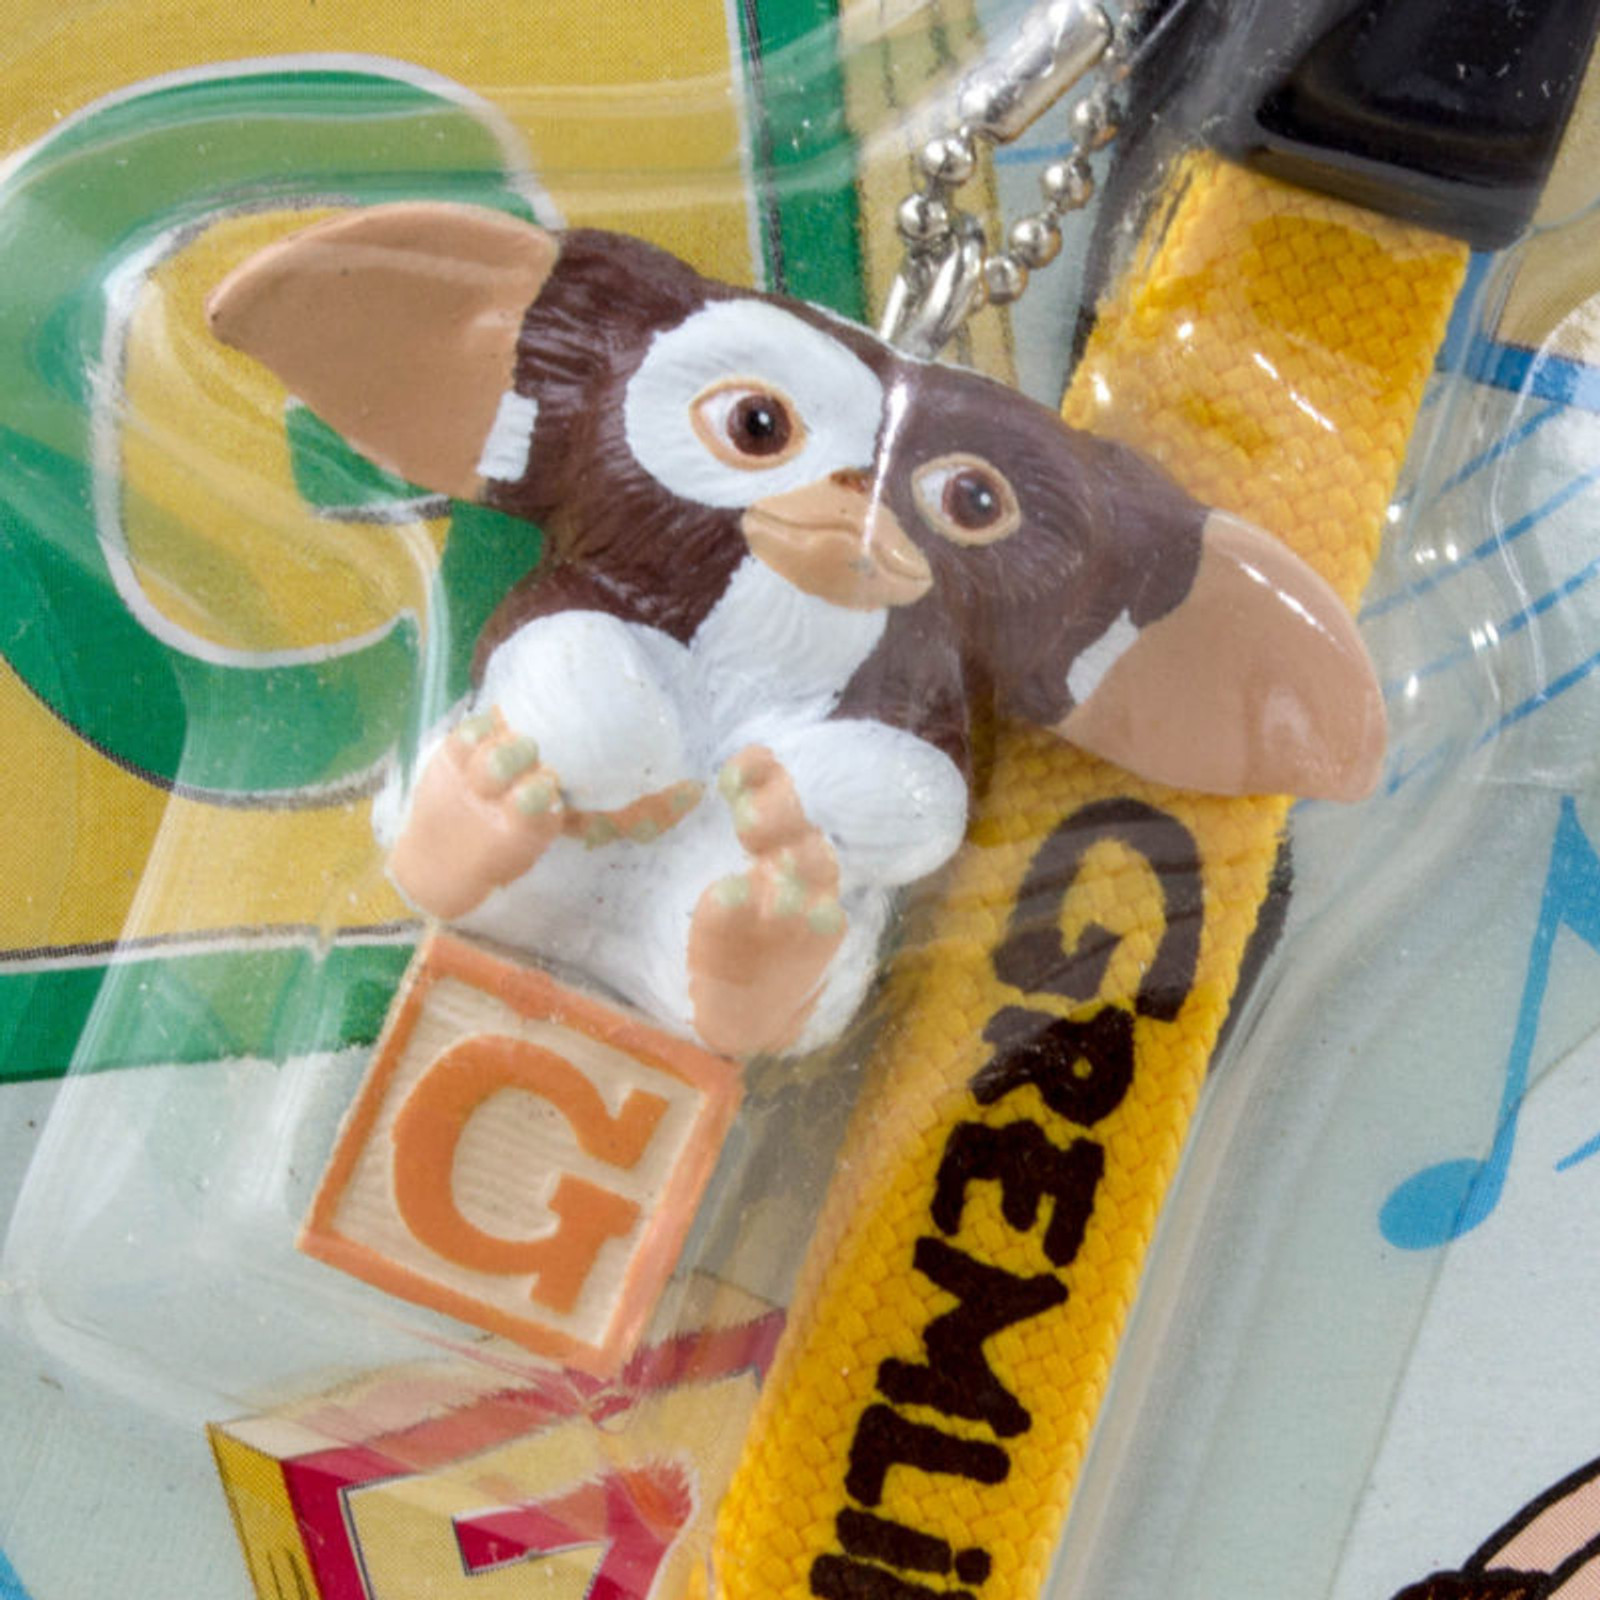 Gremlins 2 The New Batch Gizmo on Cube Figure Mobile Strap Jun Planning JAPAN